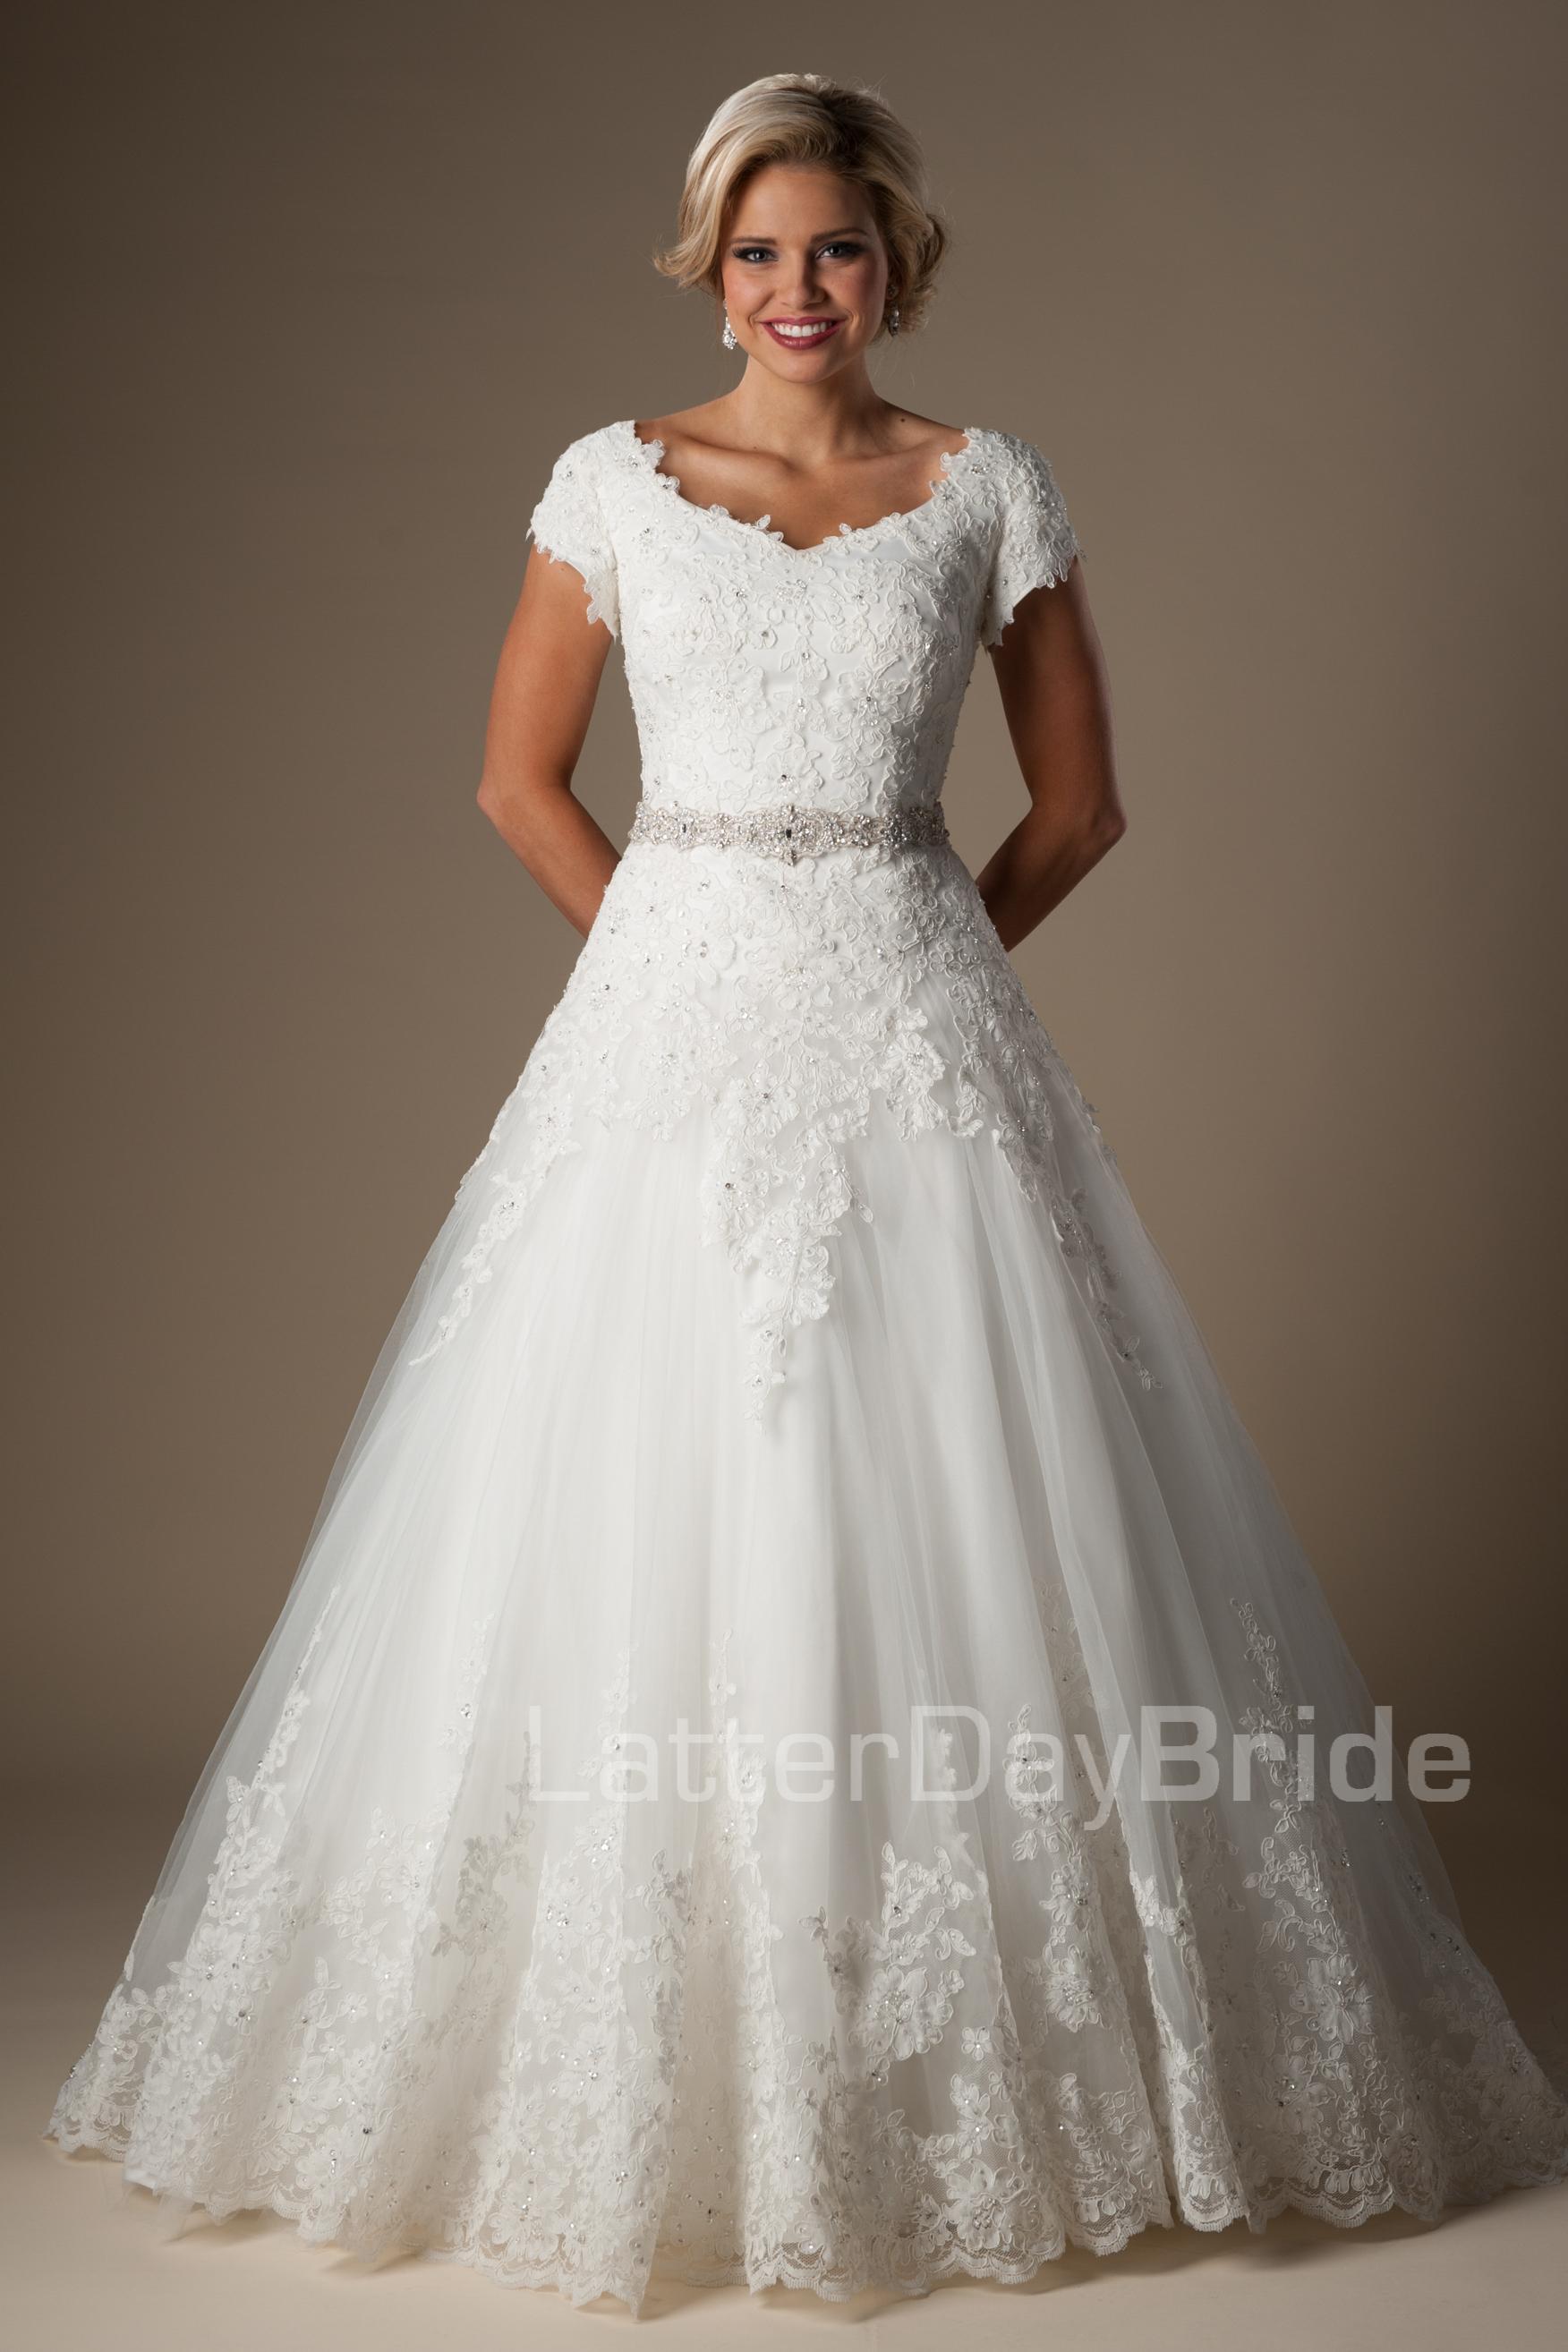 dresses for summer wedding photo - 1